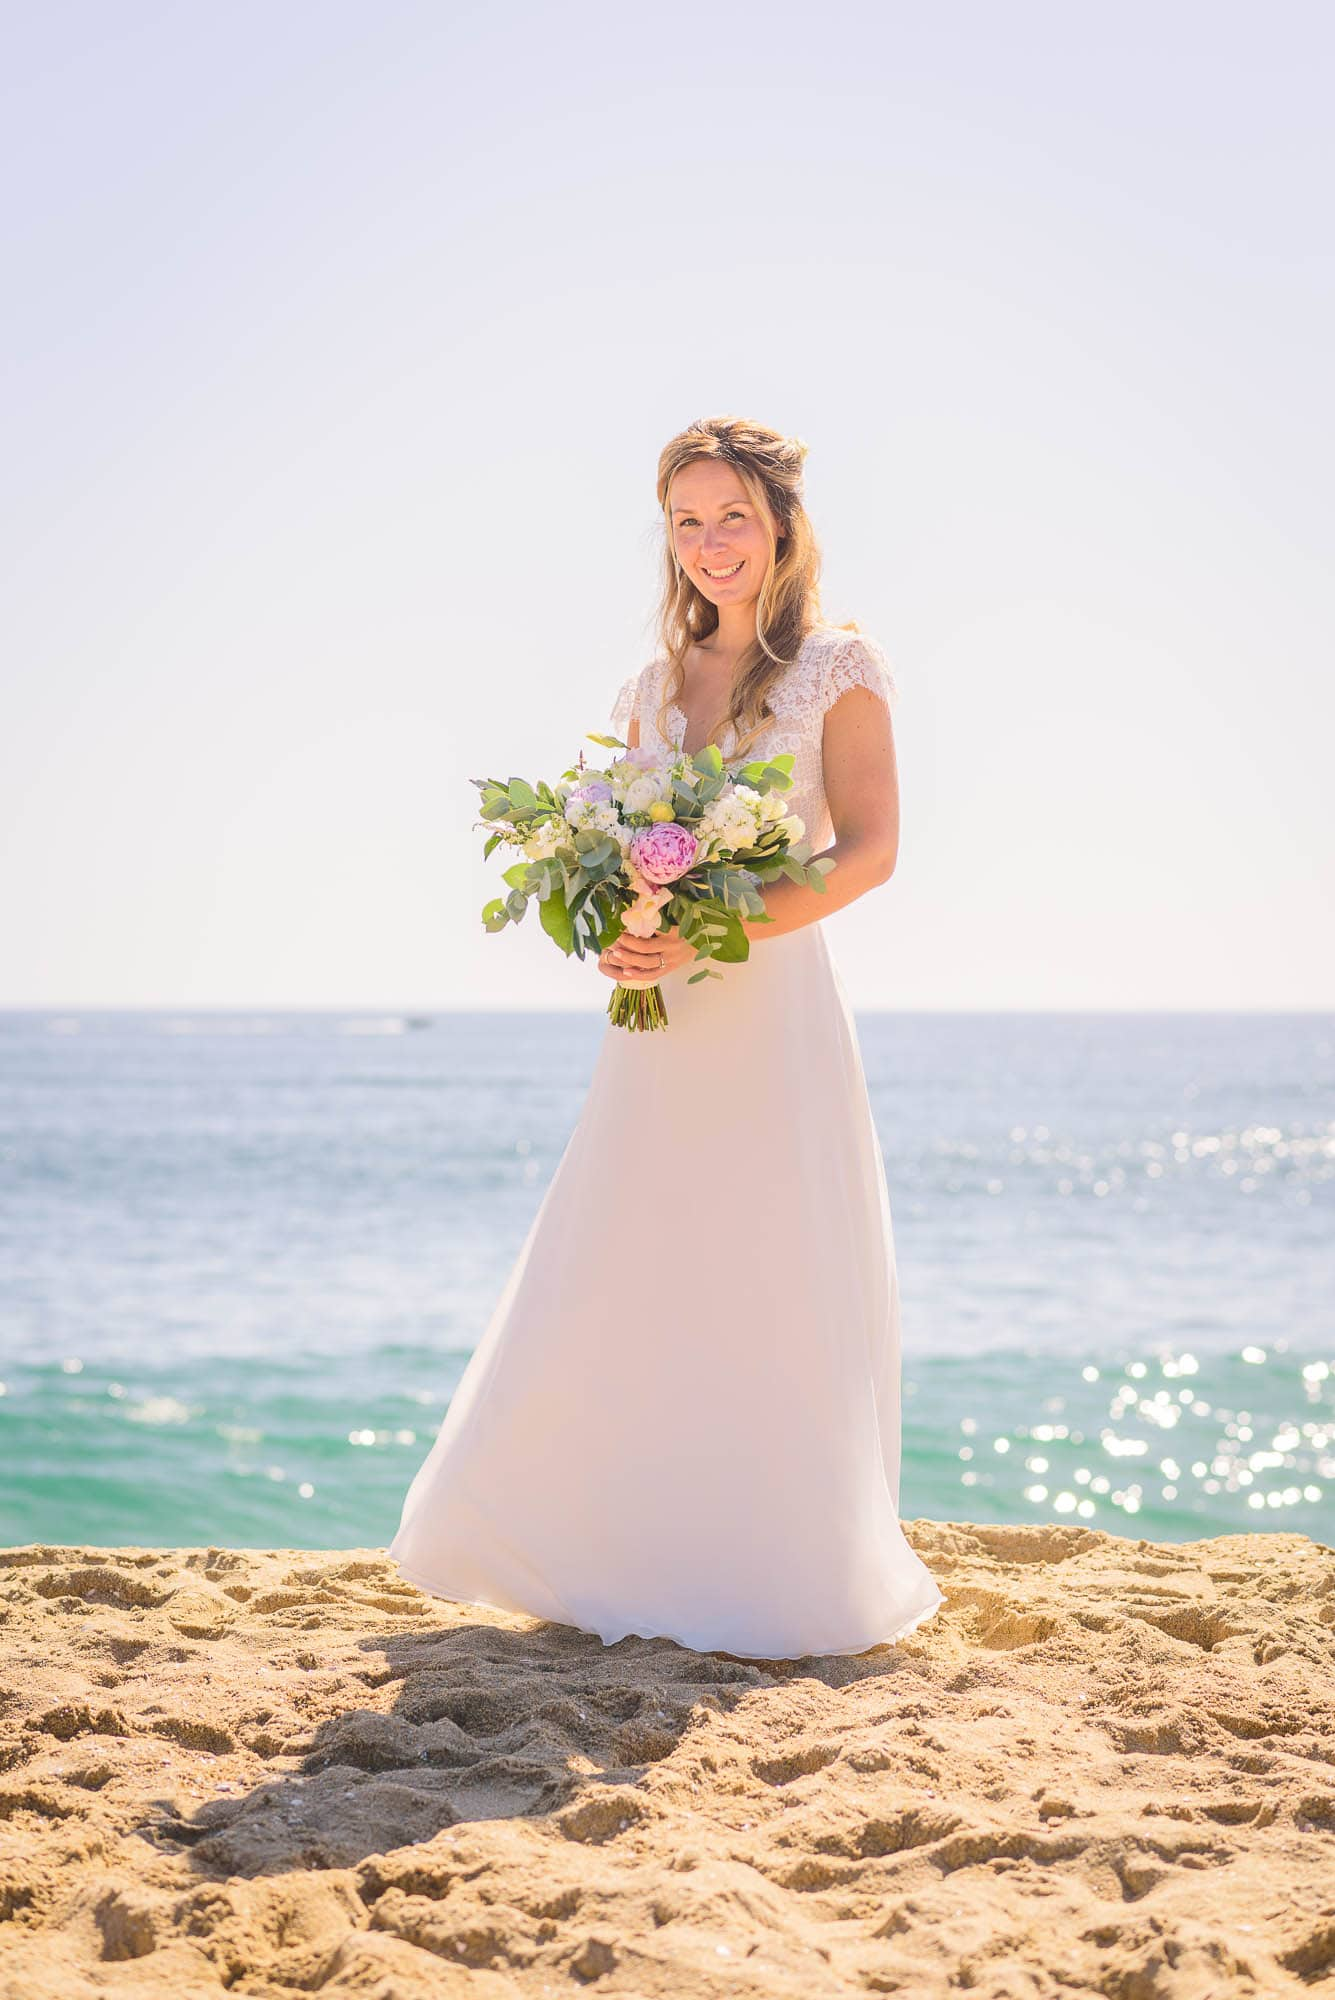 039_Alan_and_Heidi_Wedding_Verena_Andreas